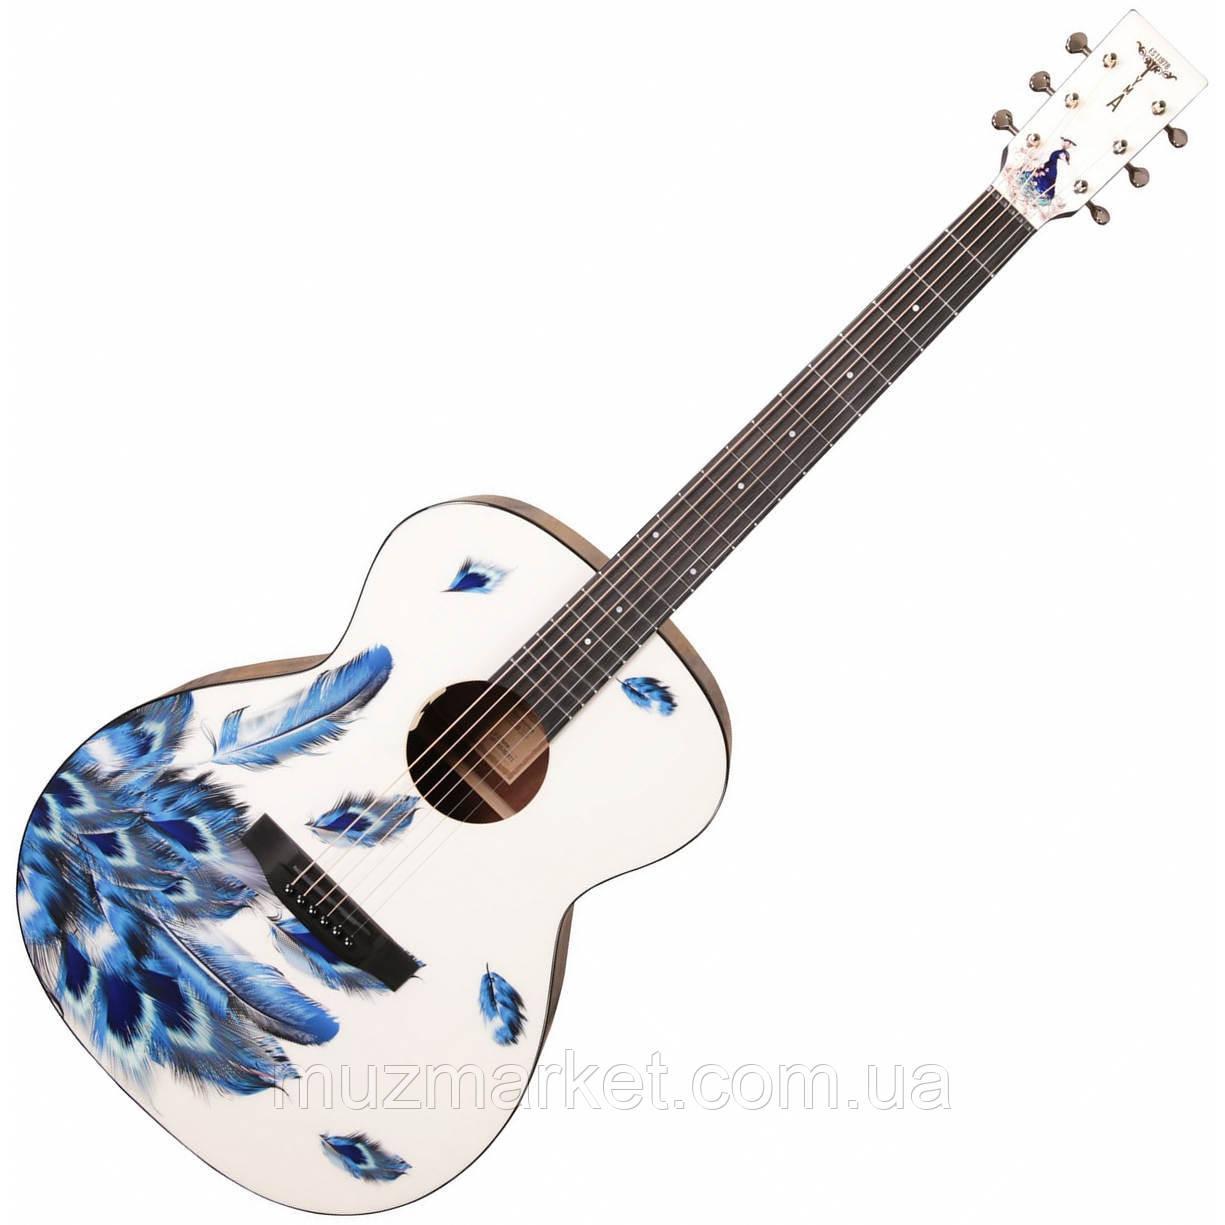 Гитара электроакустическая Tyma V-3 Plume